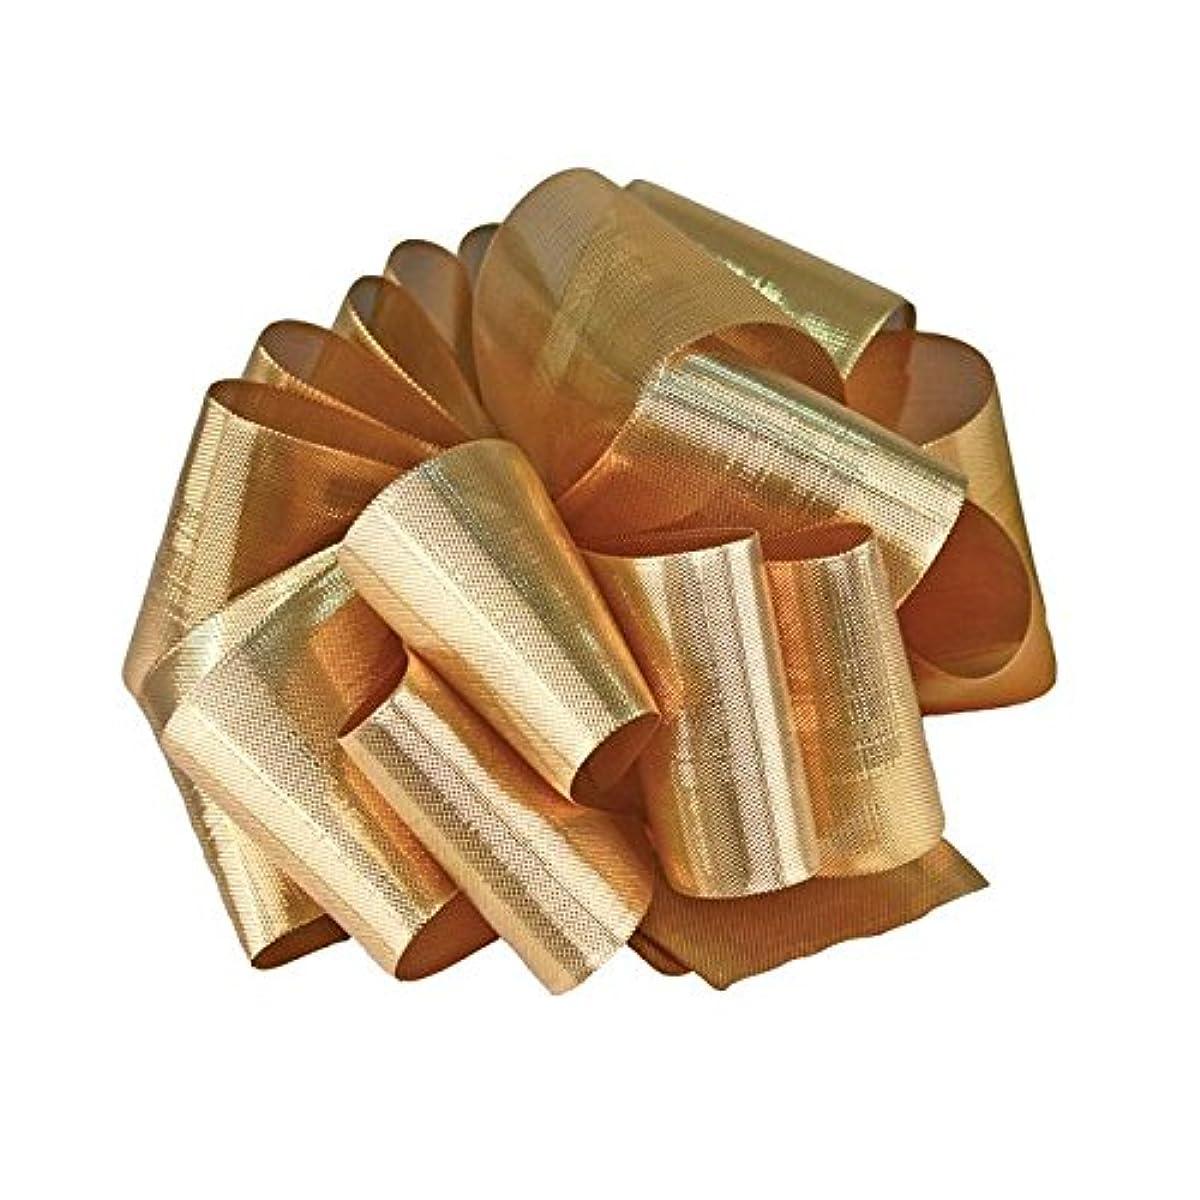 Berwick Offray Metalique Ribbon-1-1/2 Wide X 25 Yards Ribbon Gold